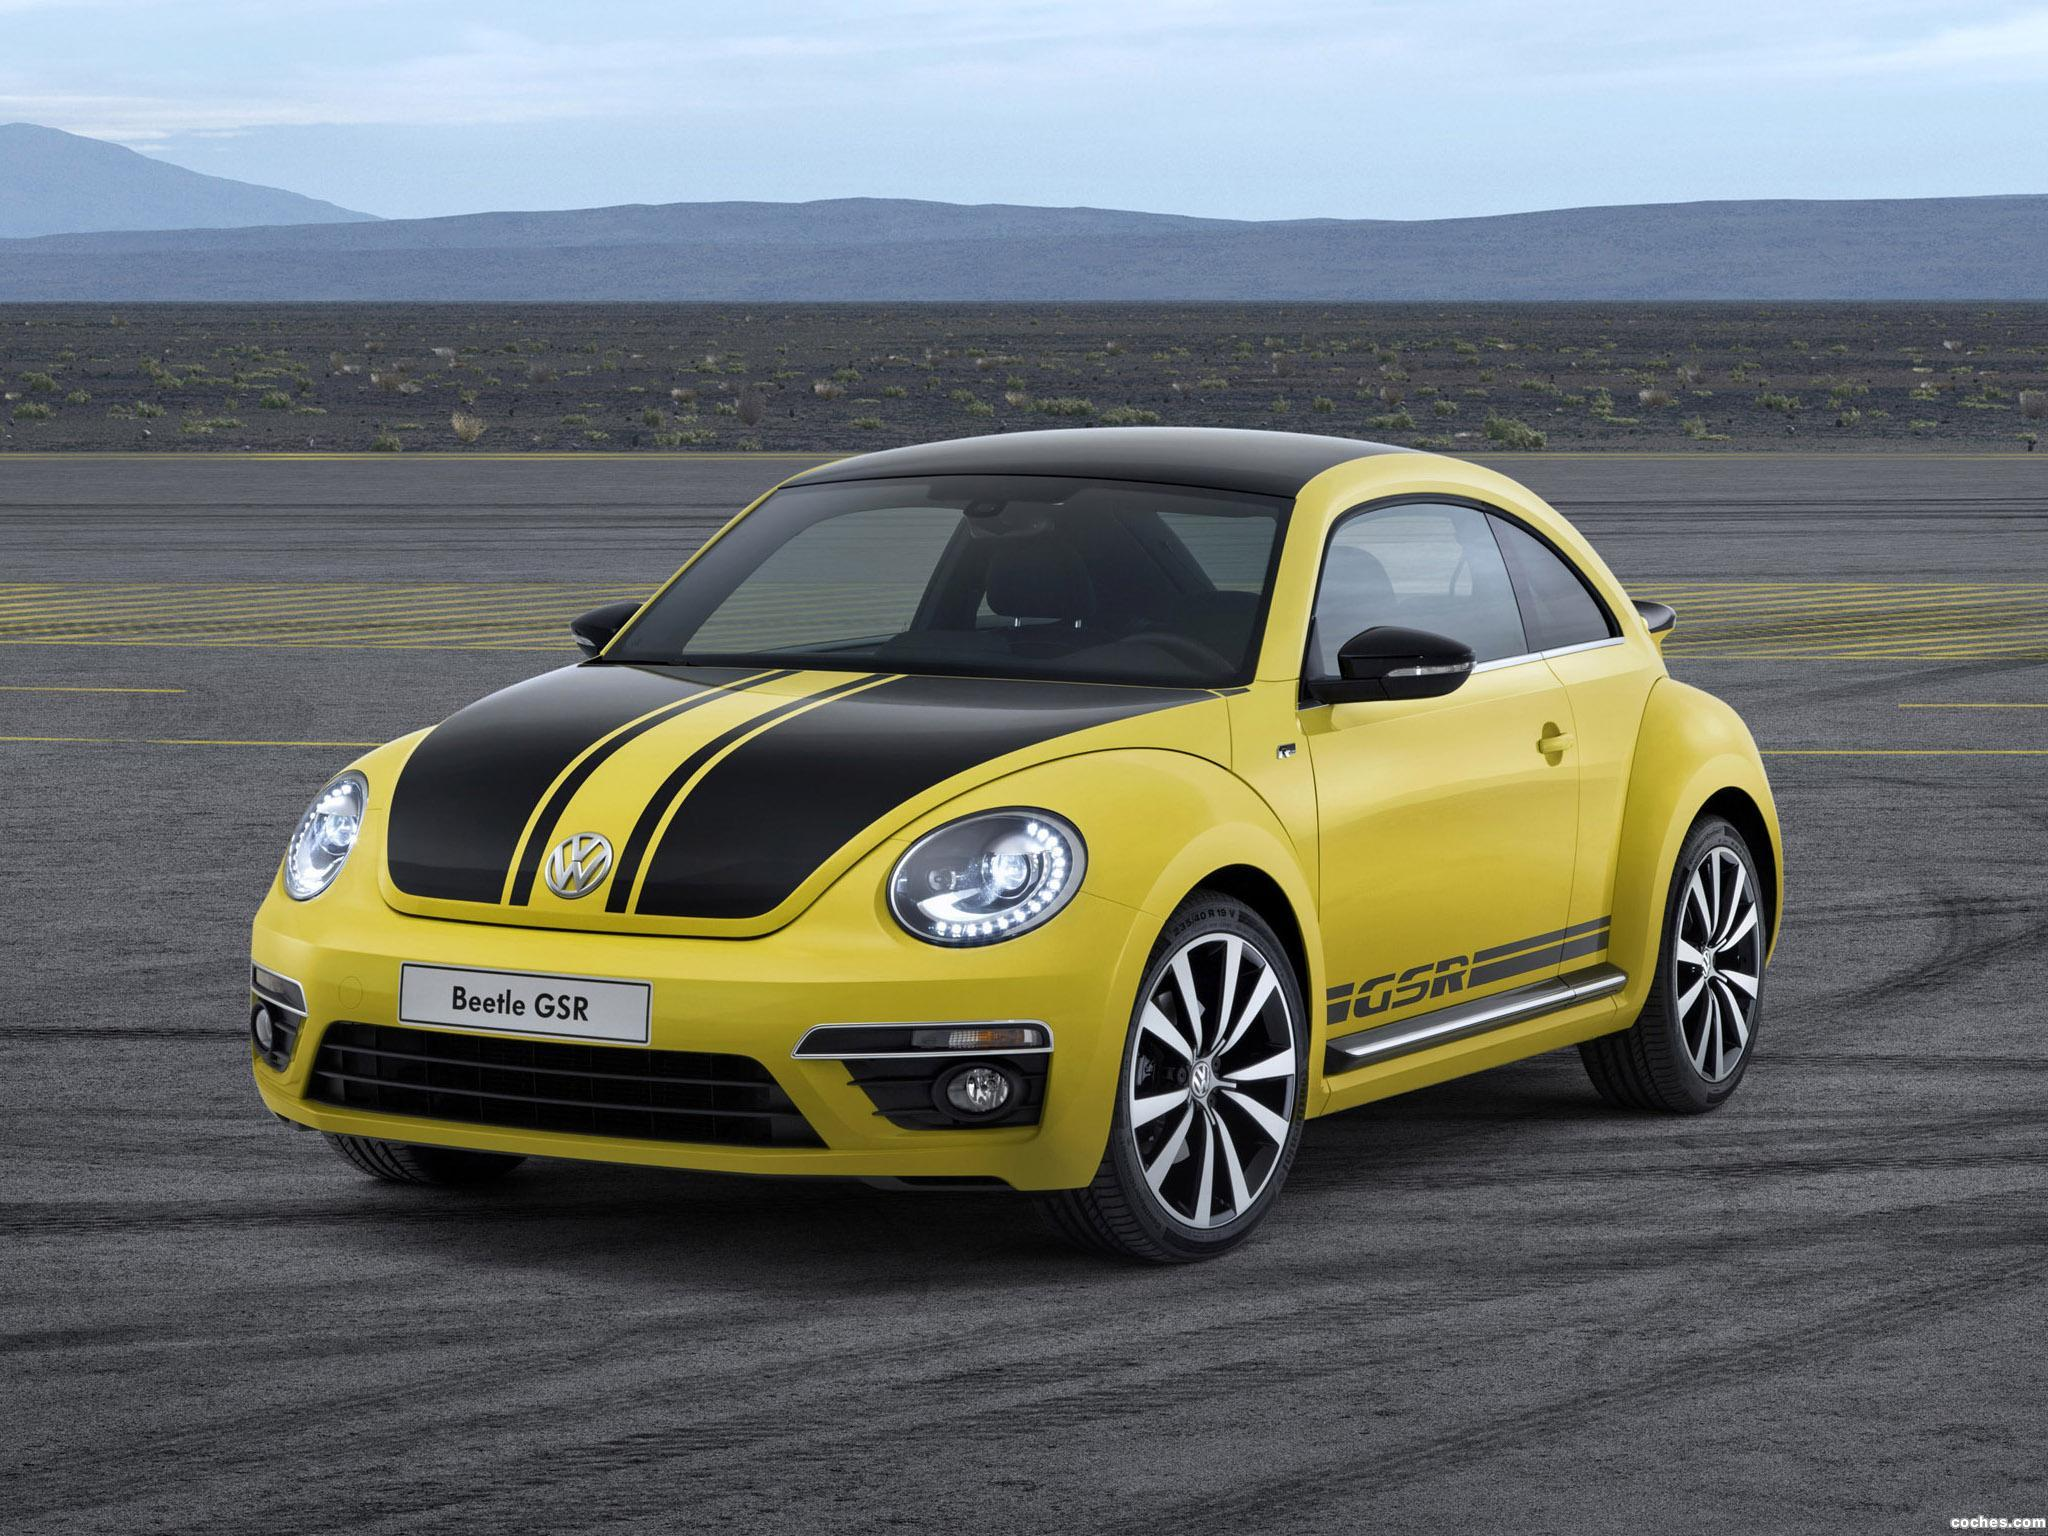 Foto 0 de Volkswagen Beetle GSR Limited Edition 2013